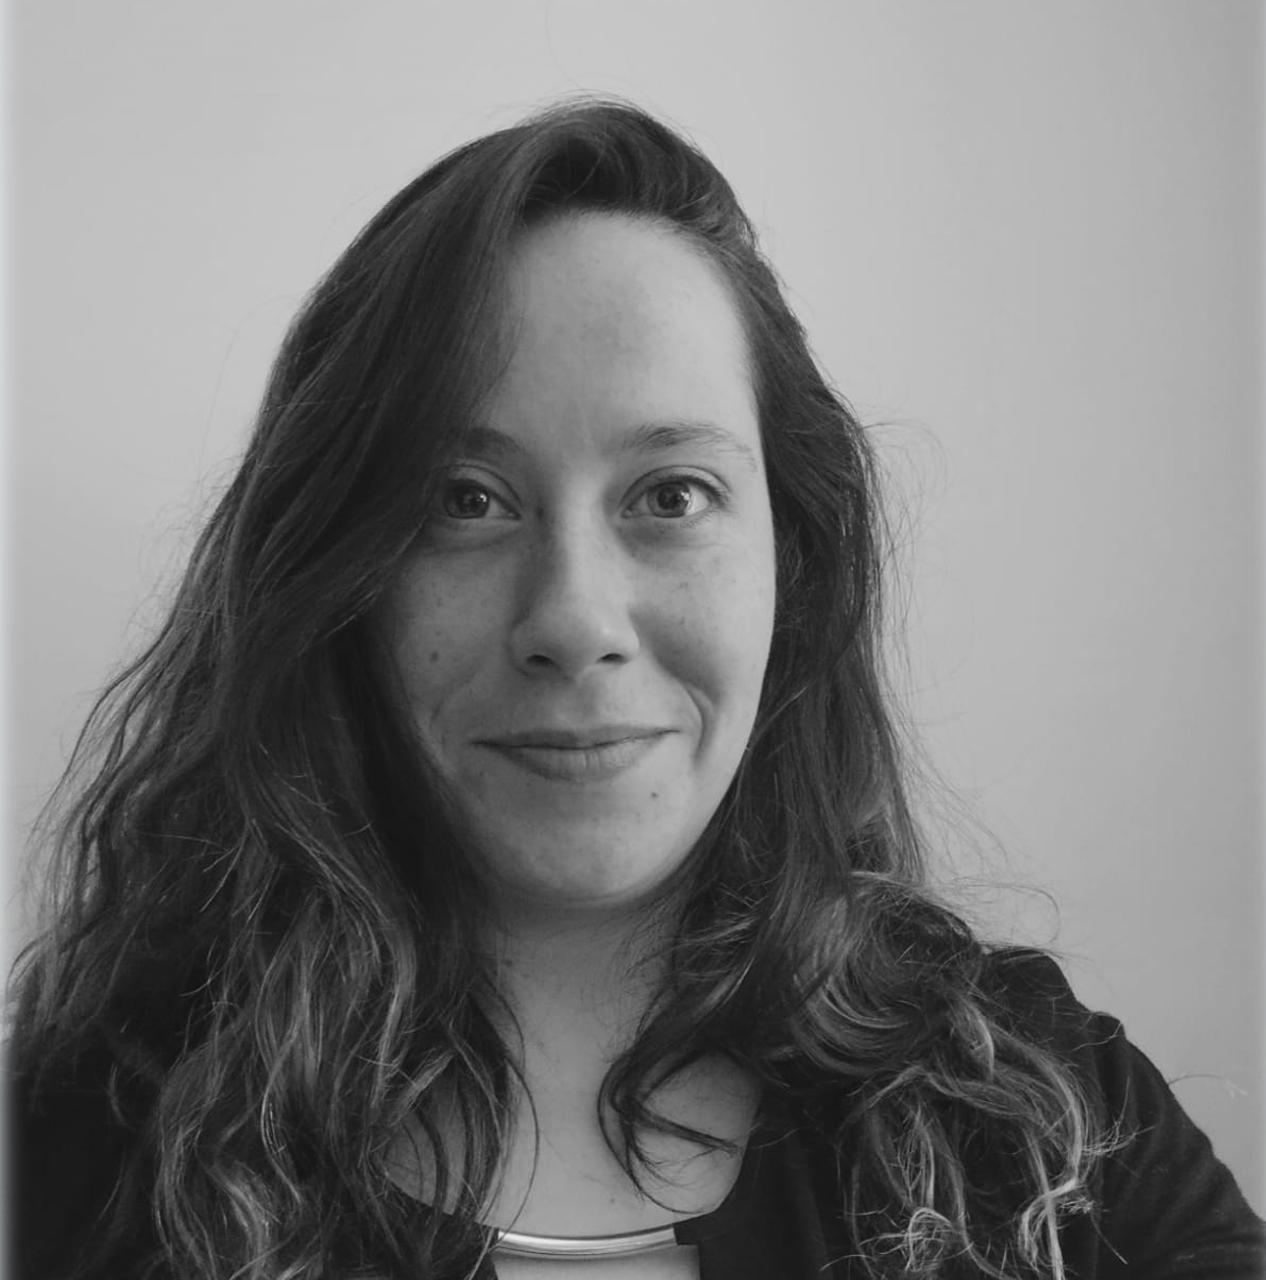 Andreia Oliveira Ferreira